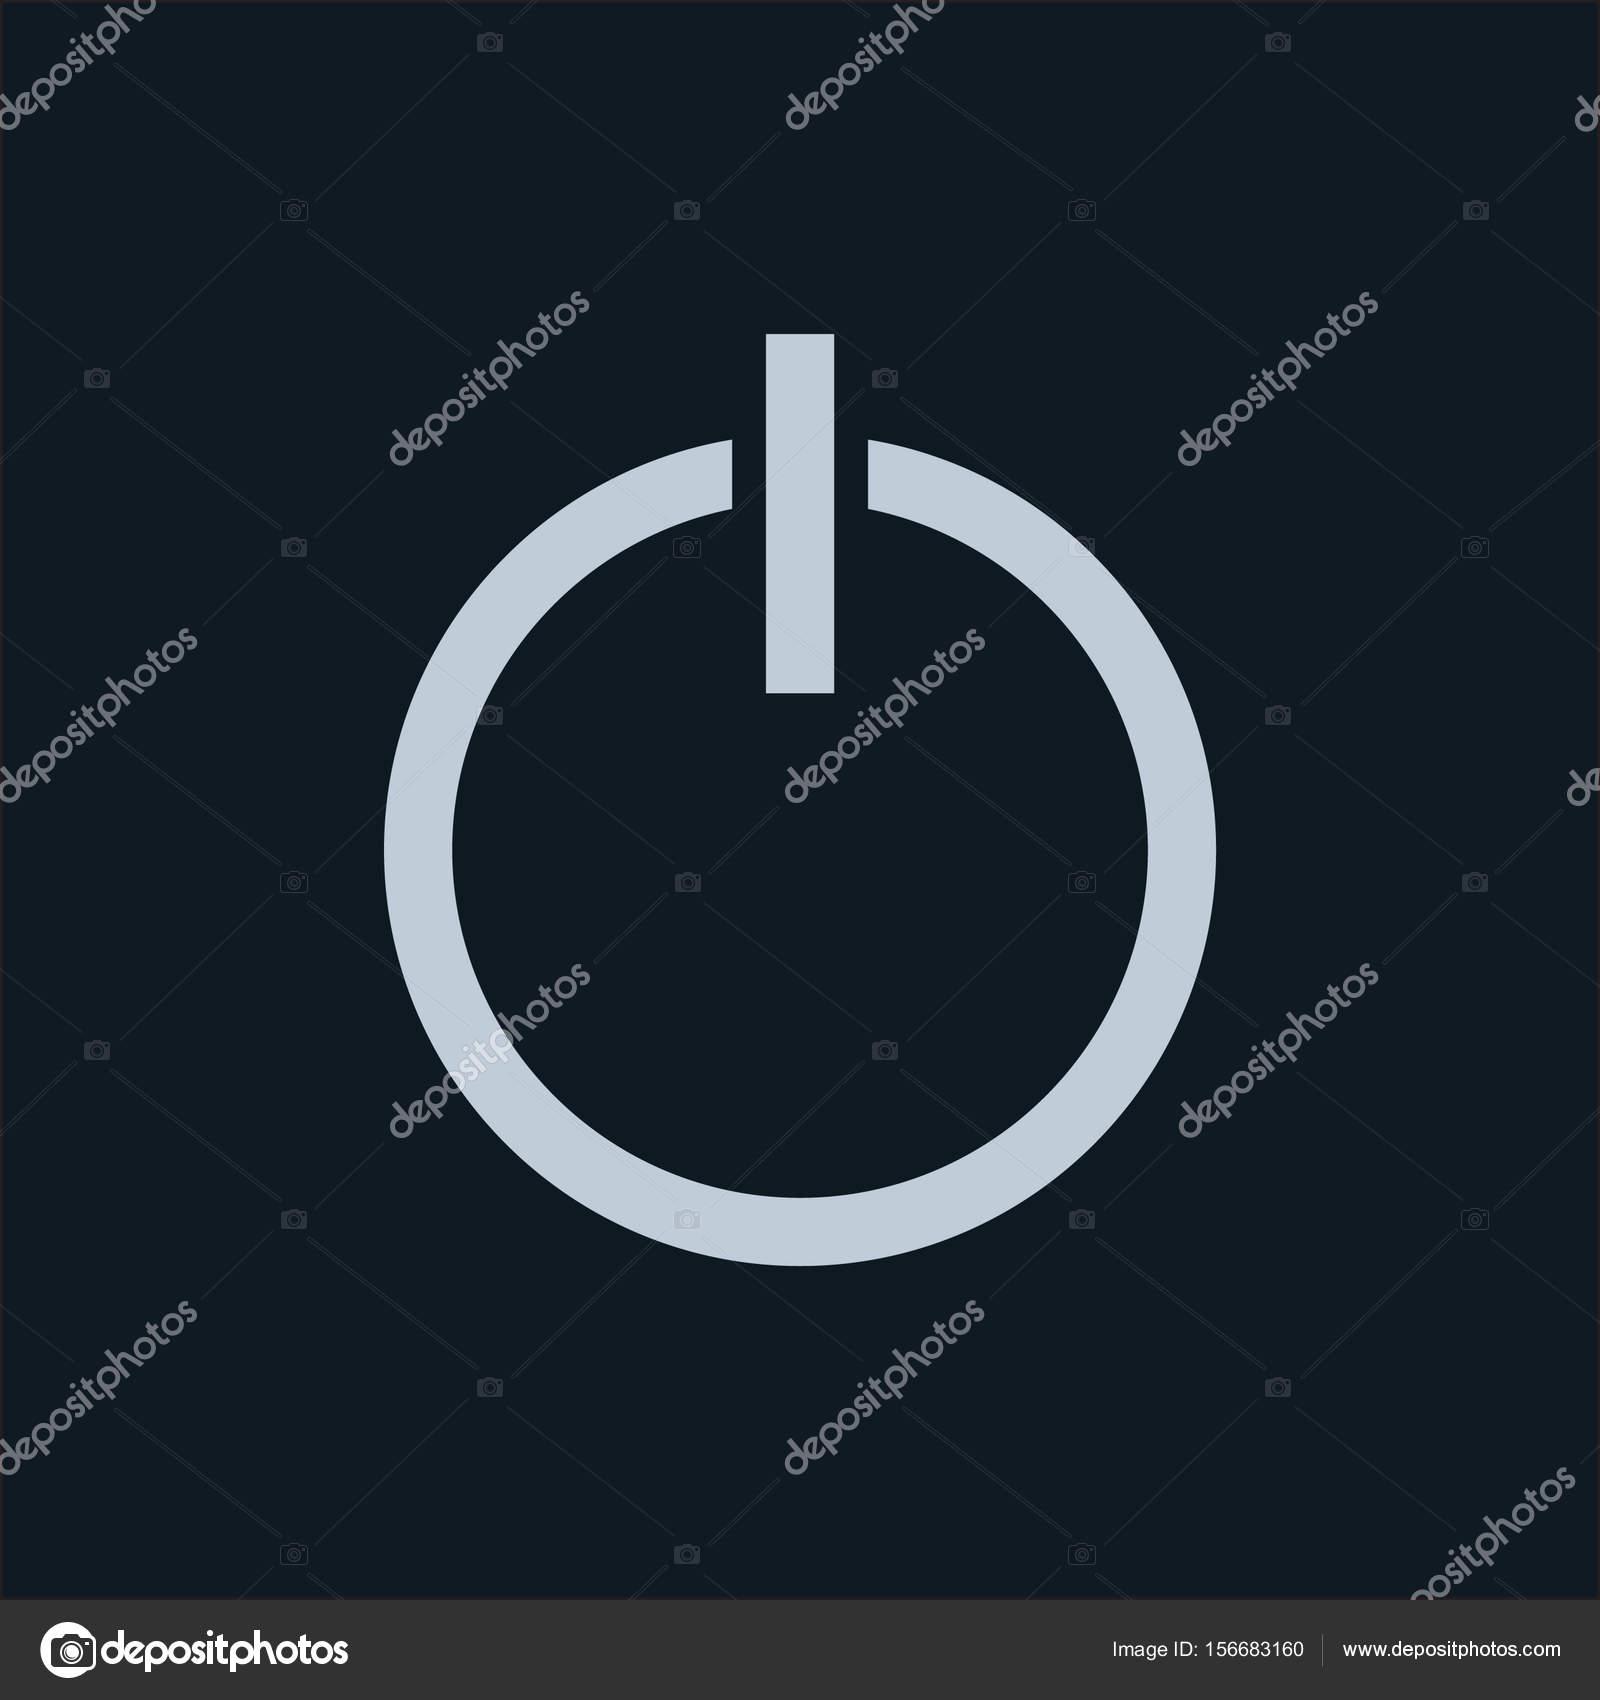 Symbol zu wechseln, Vektor — Stockvektor © Flat.Icon #156683160